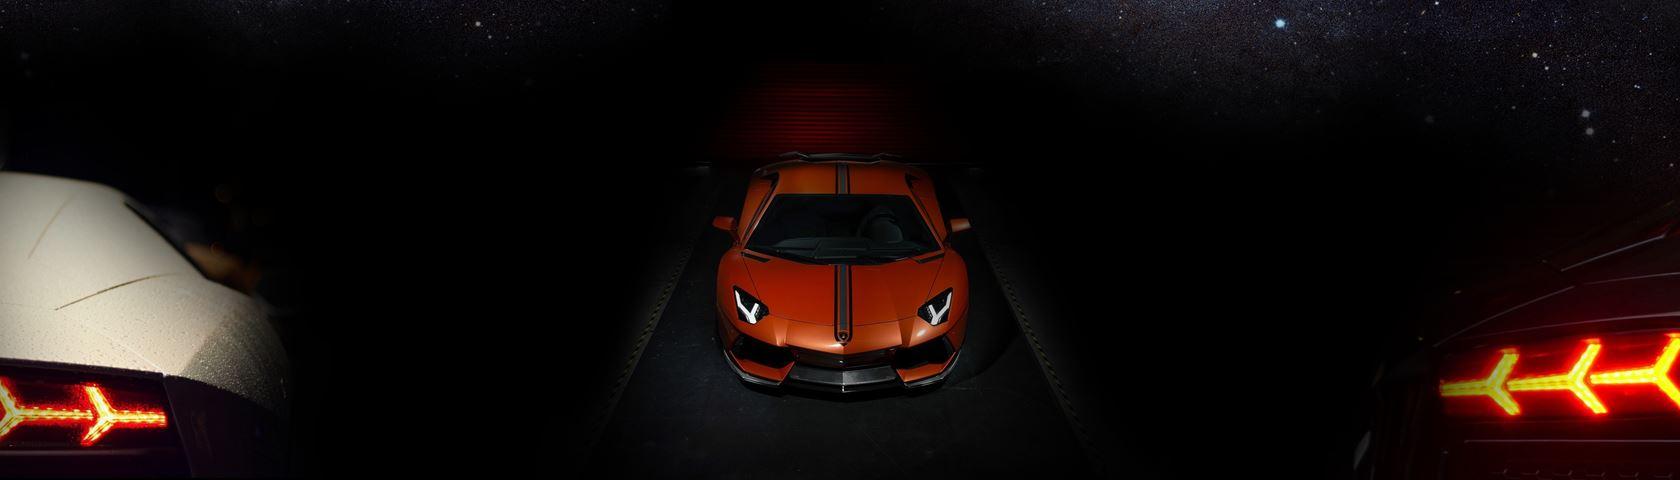 Lamborghini Aventador Tripple Screen